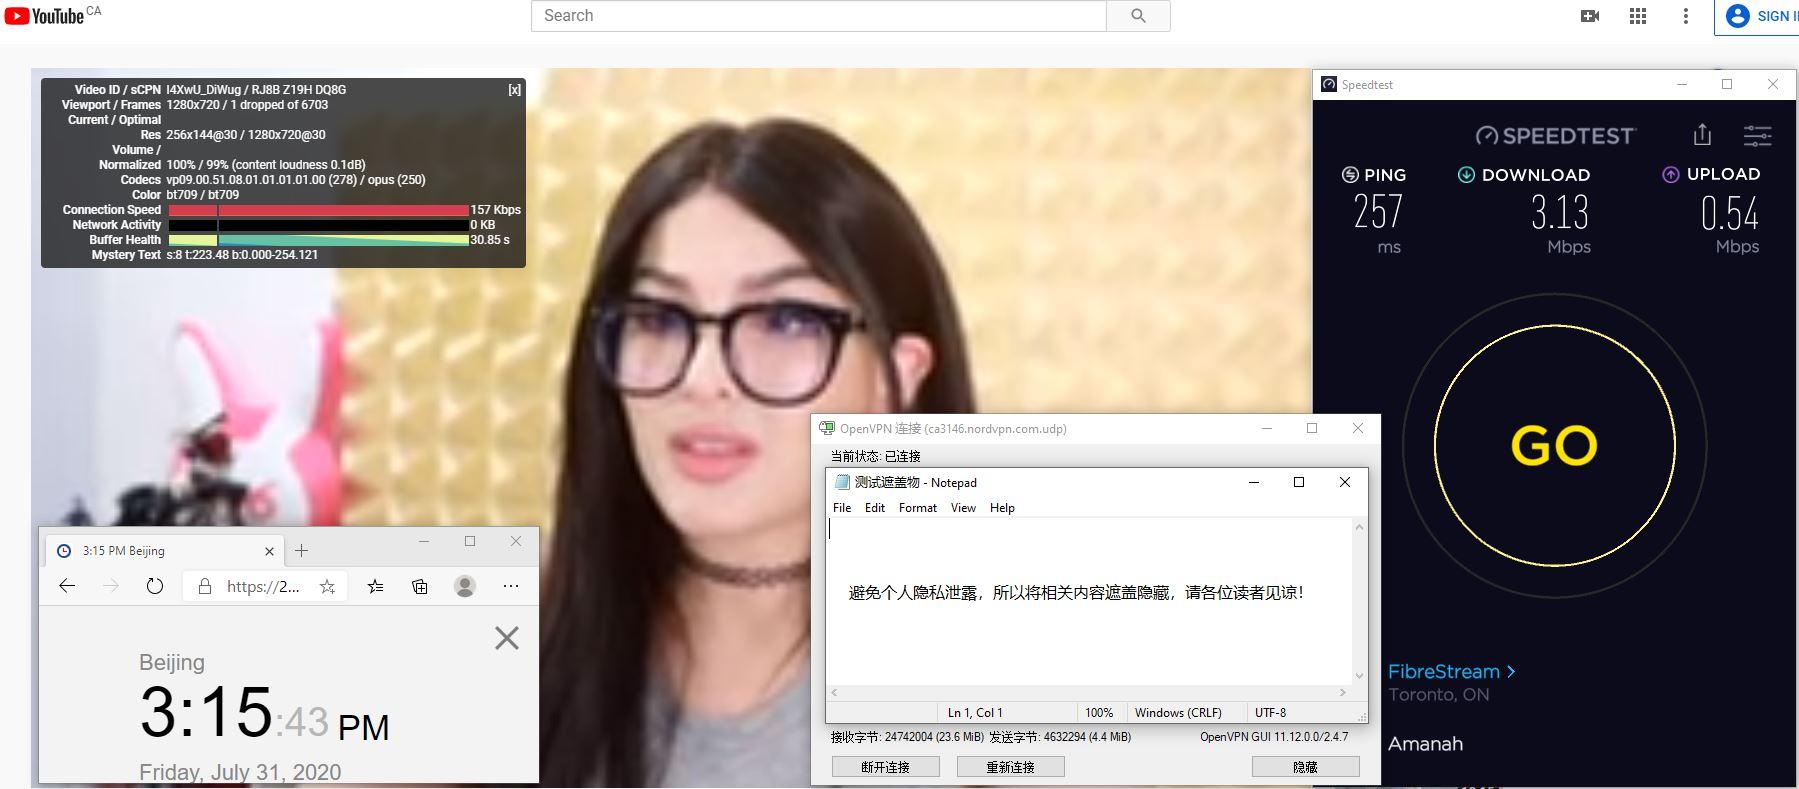 Windows10 NordVPN Openvpn ca3146 中国VPN 翻墙 科学上网 翻墙速度测试 - 20200731